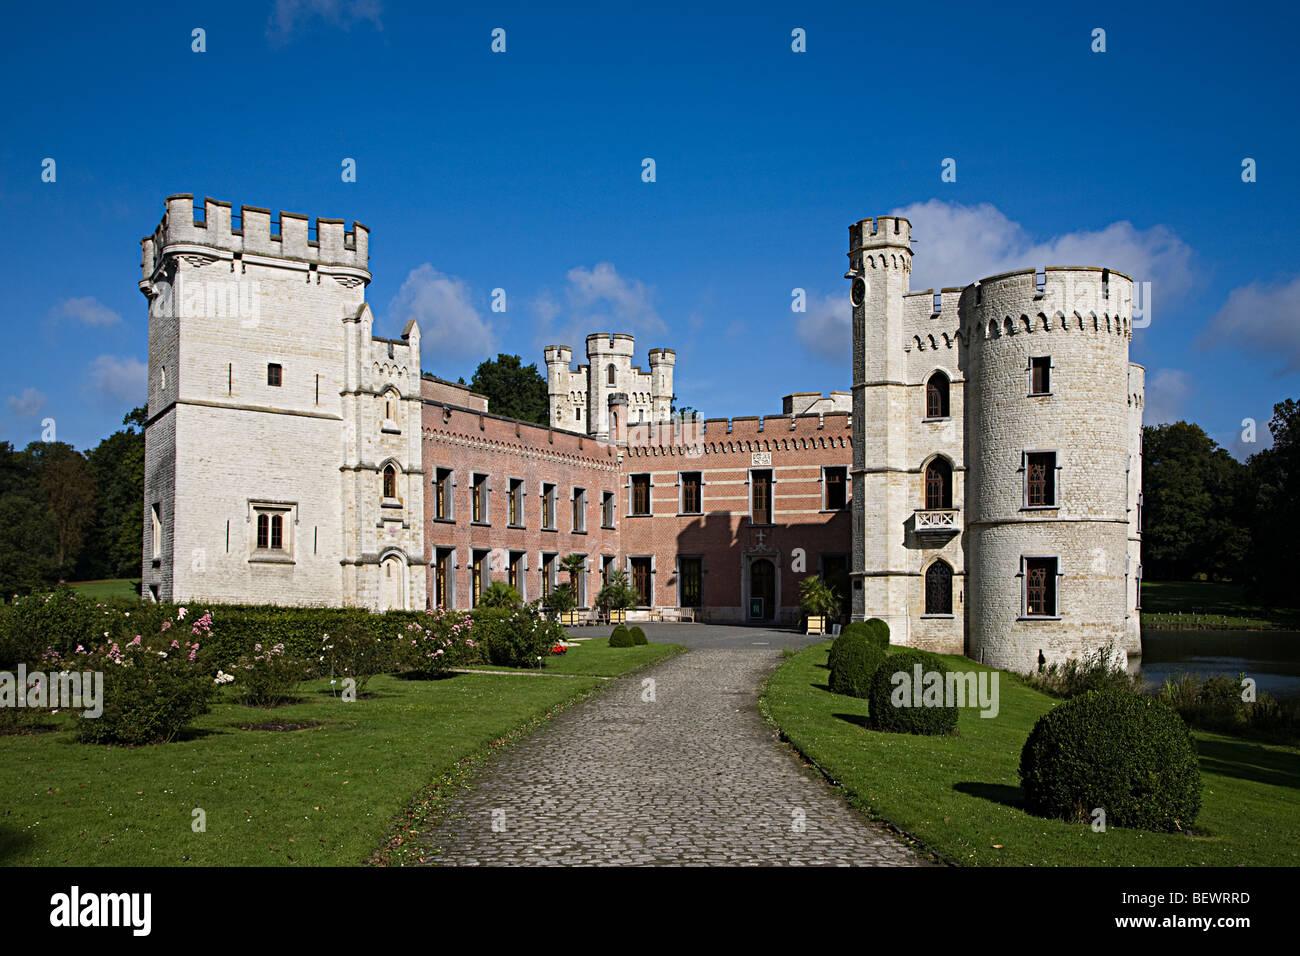 Bouchout Castle National Botanic Gardens Nationale Plantentuin Meise Brussels Belgium - Stock Image